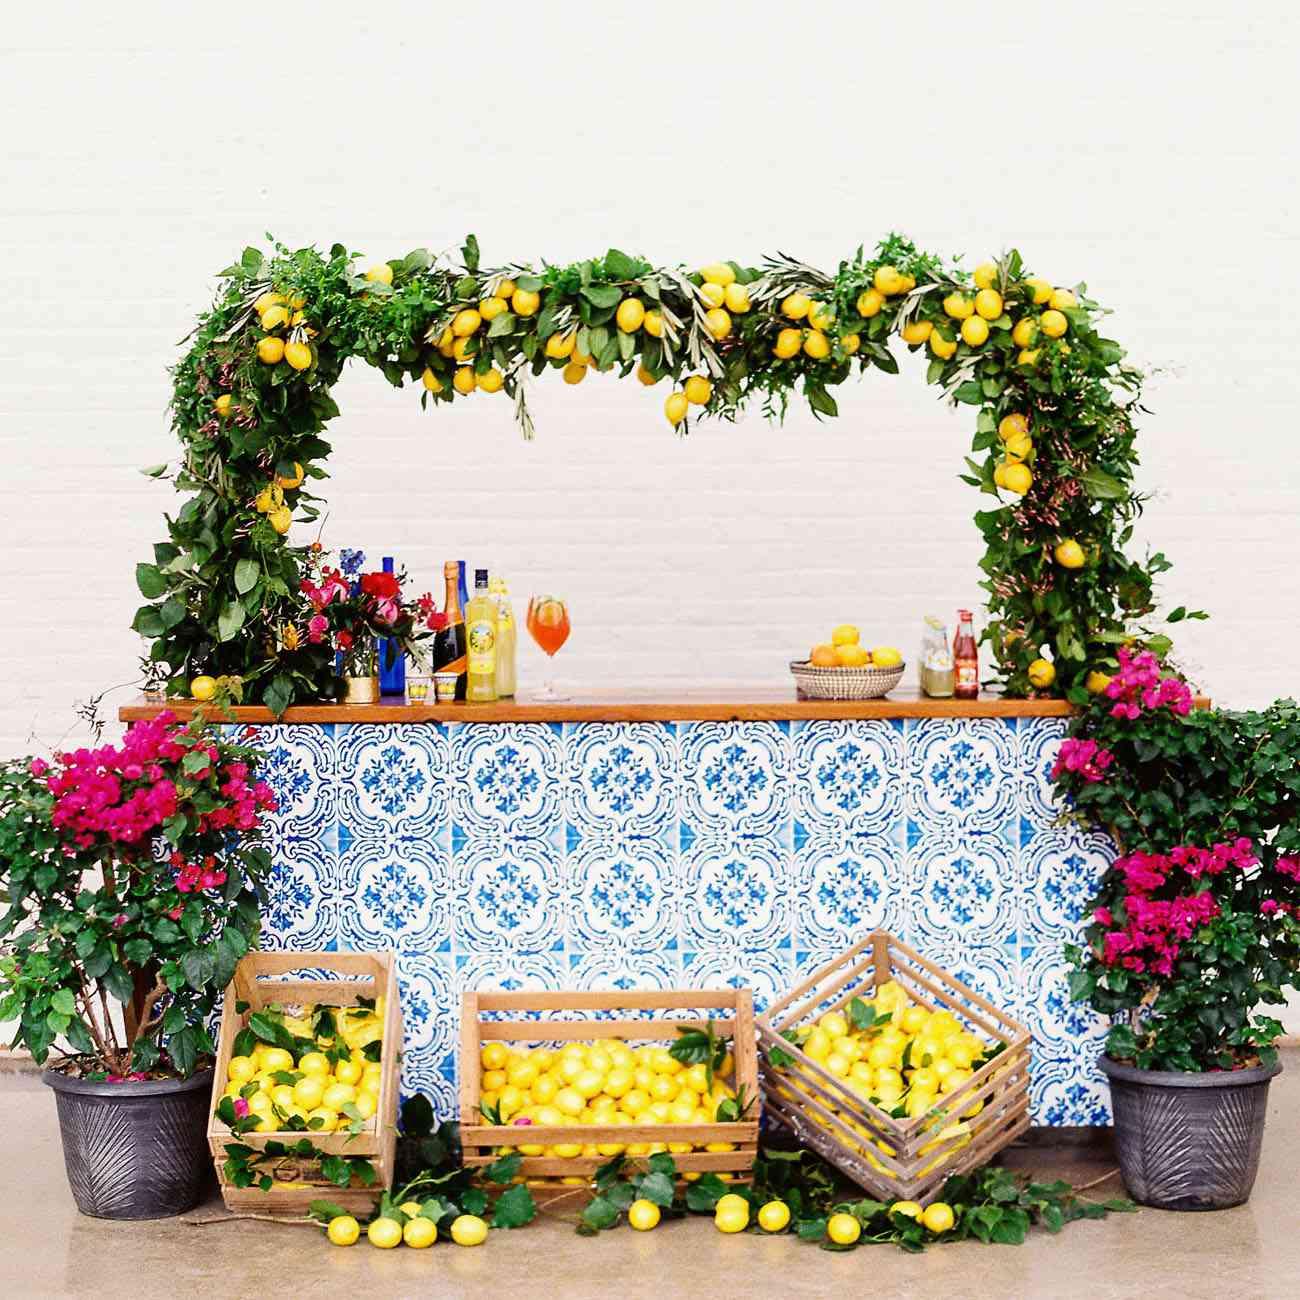 Colorful mediterranean bar with lemons